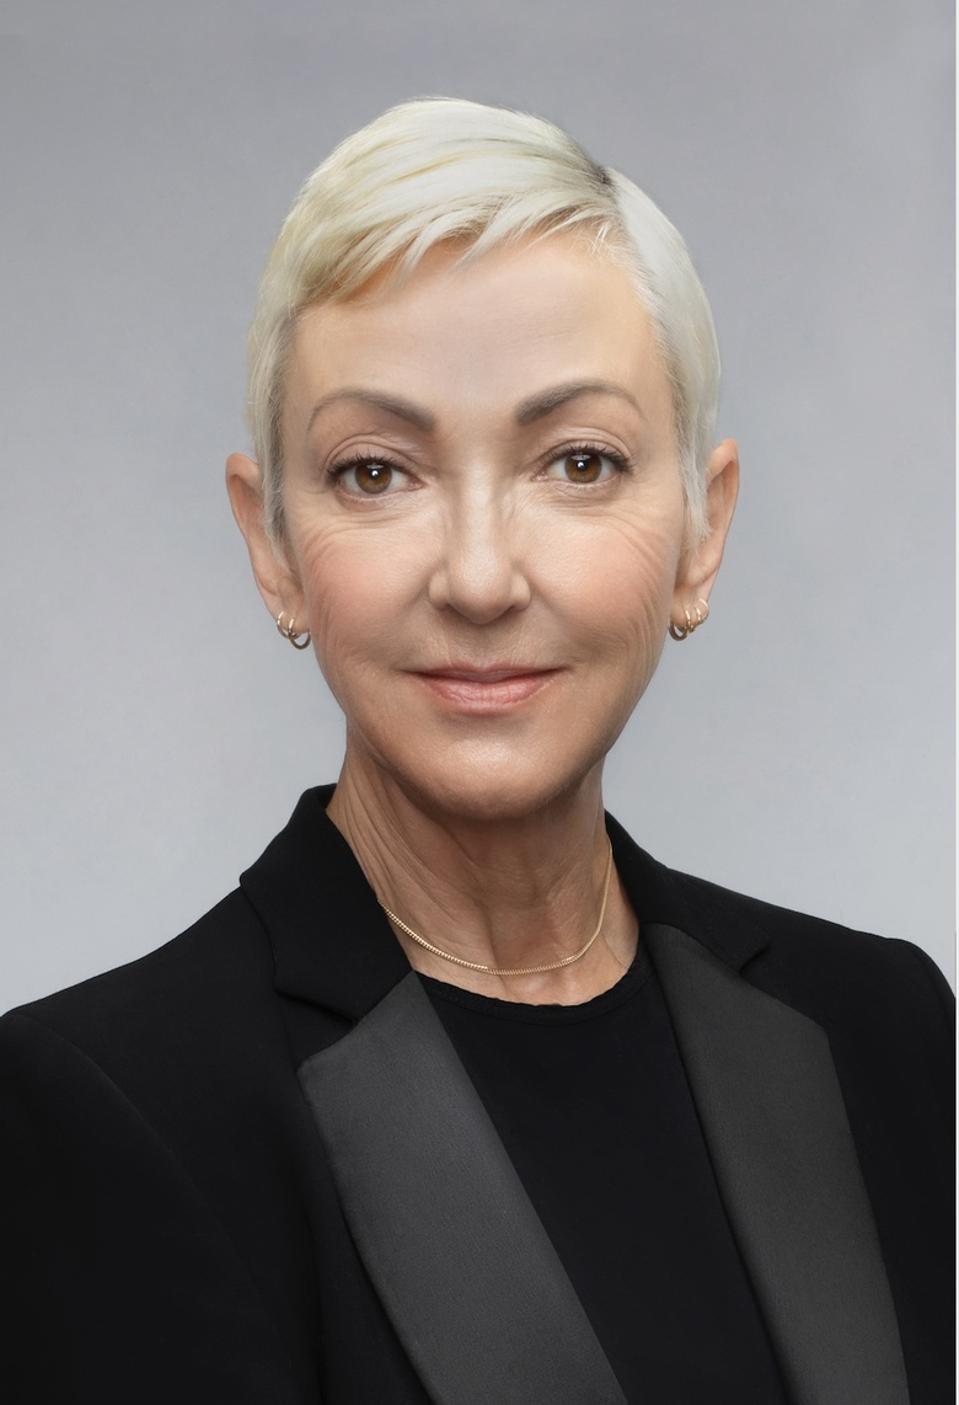 a headshot of a business woman